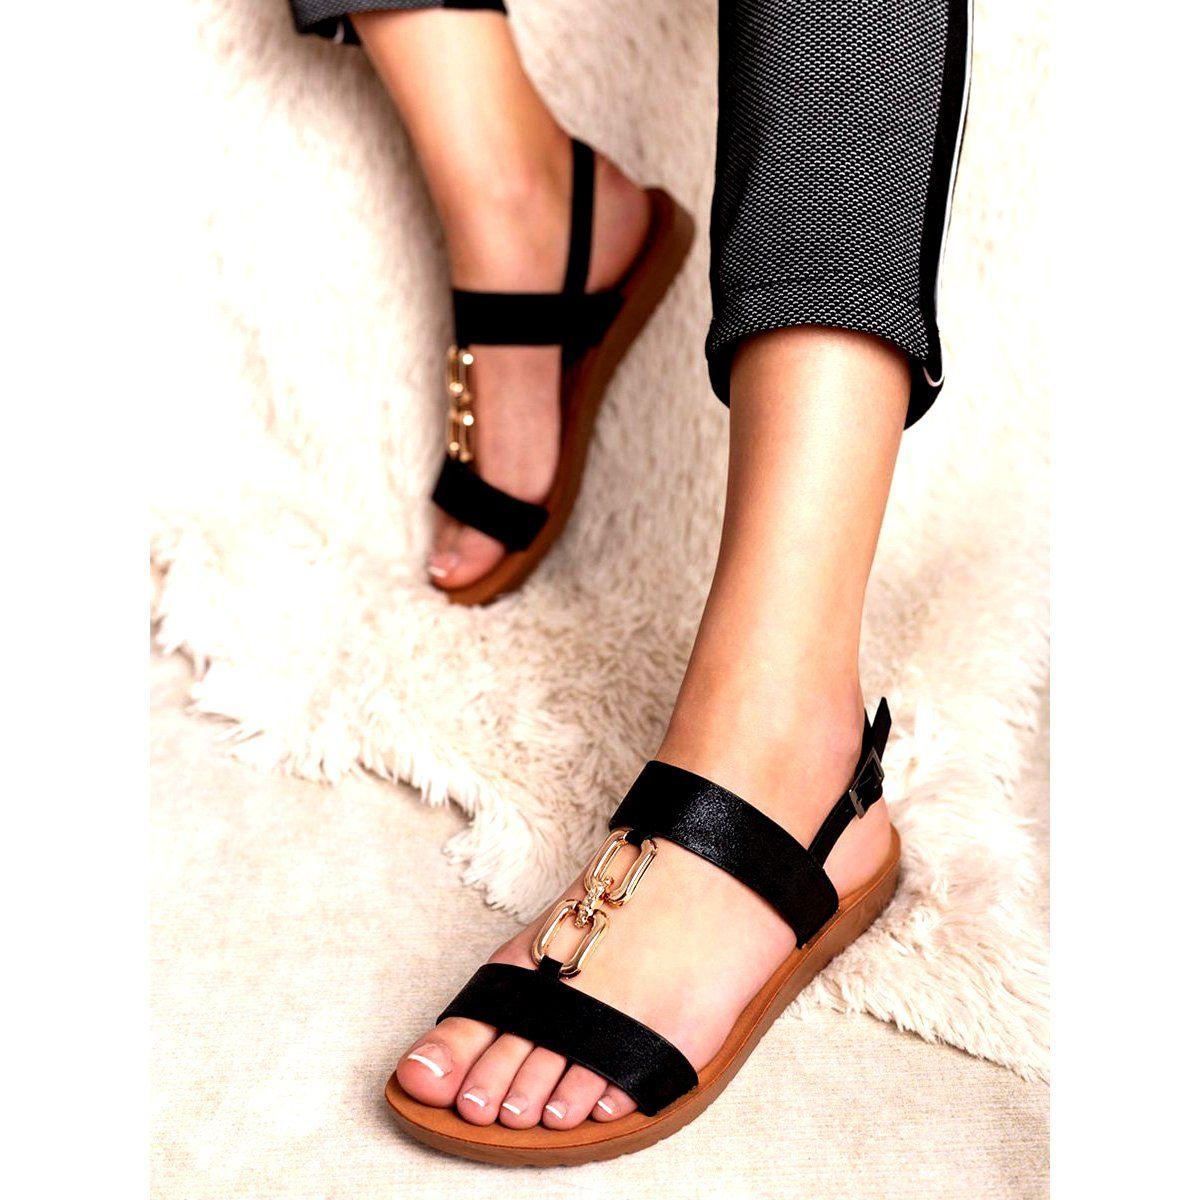 Plaskie Sandalki Vinceza Czarne Sandal Espadrille Espadrilles Shoes